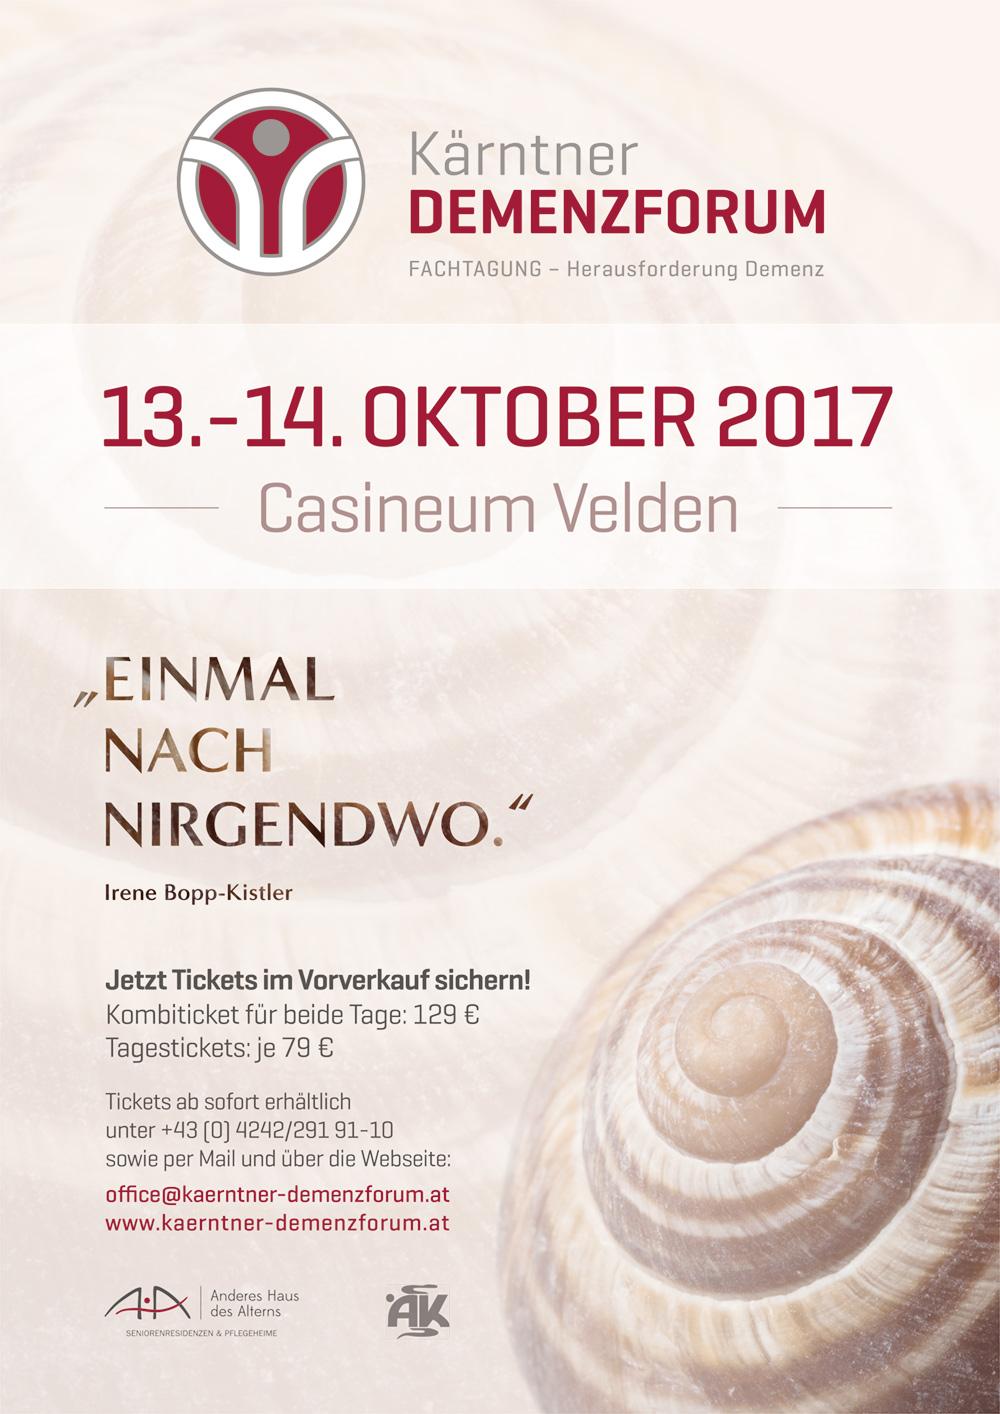 Plakat Kärntner Demenzforum 2017